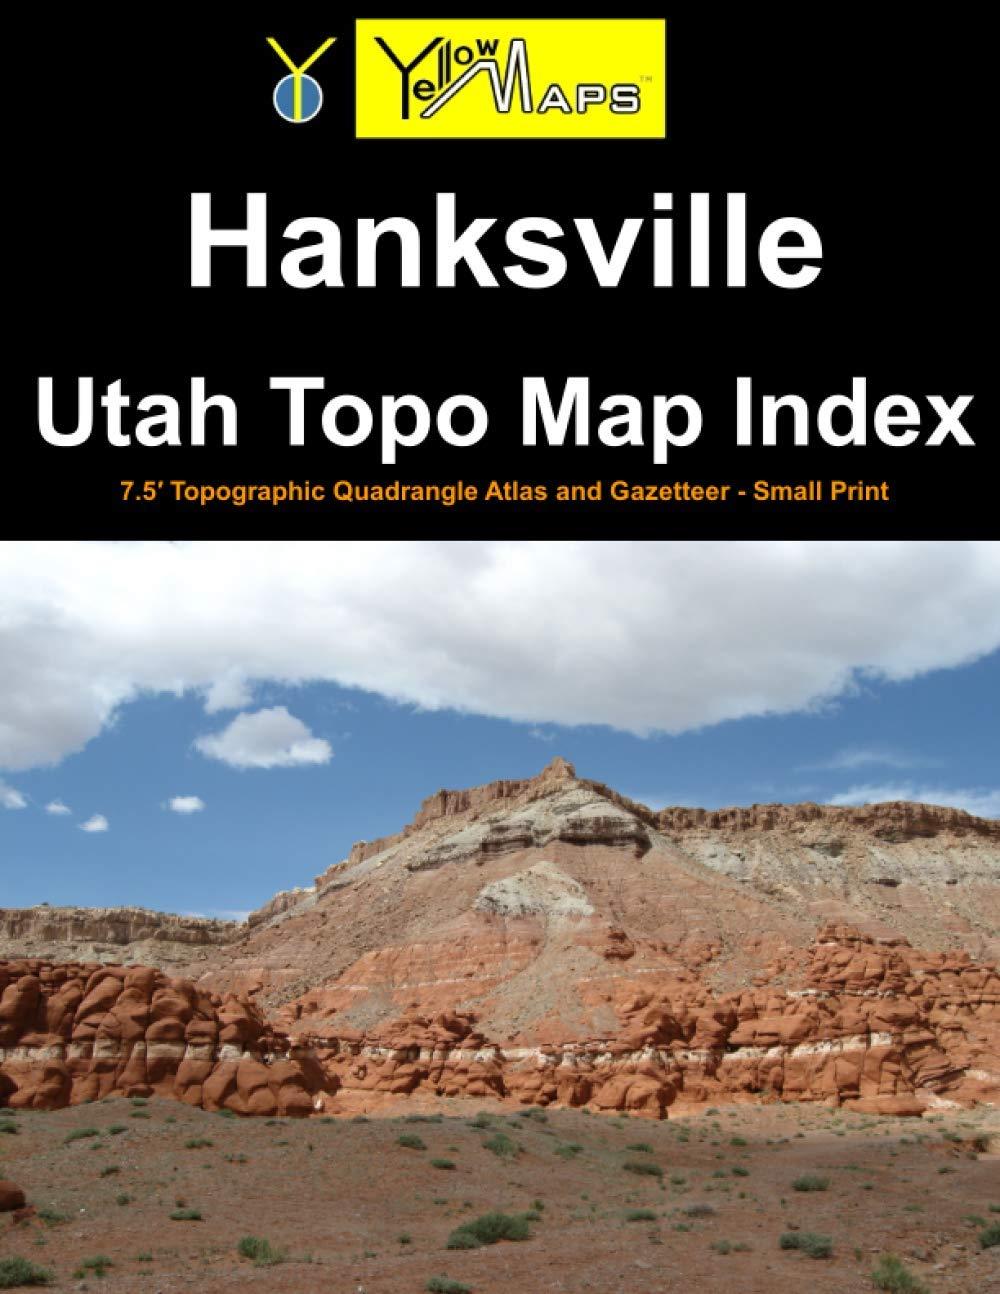 Paperback atlas: Hanksville Utah Topo Map Index